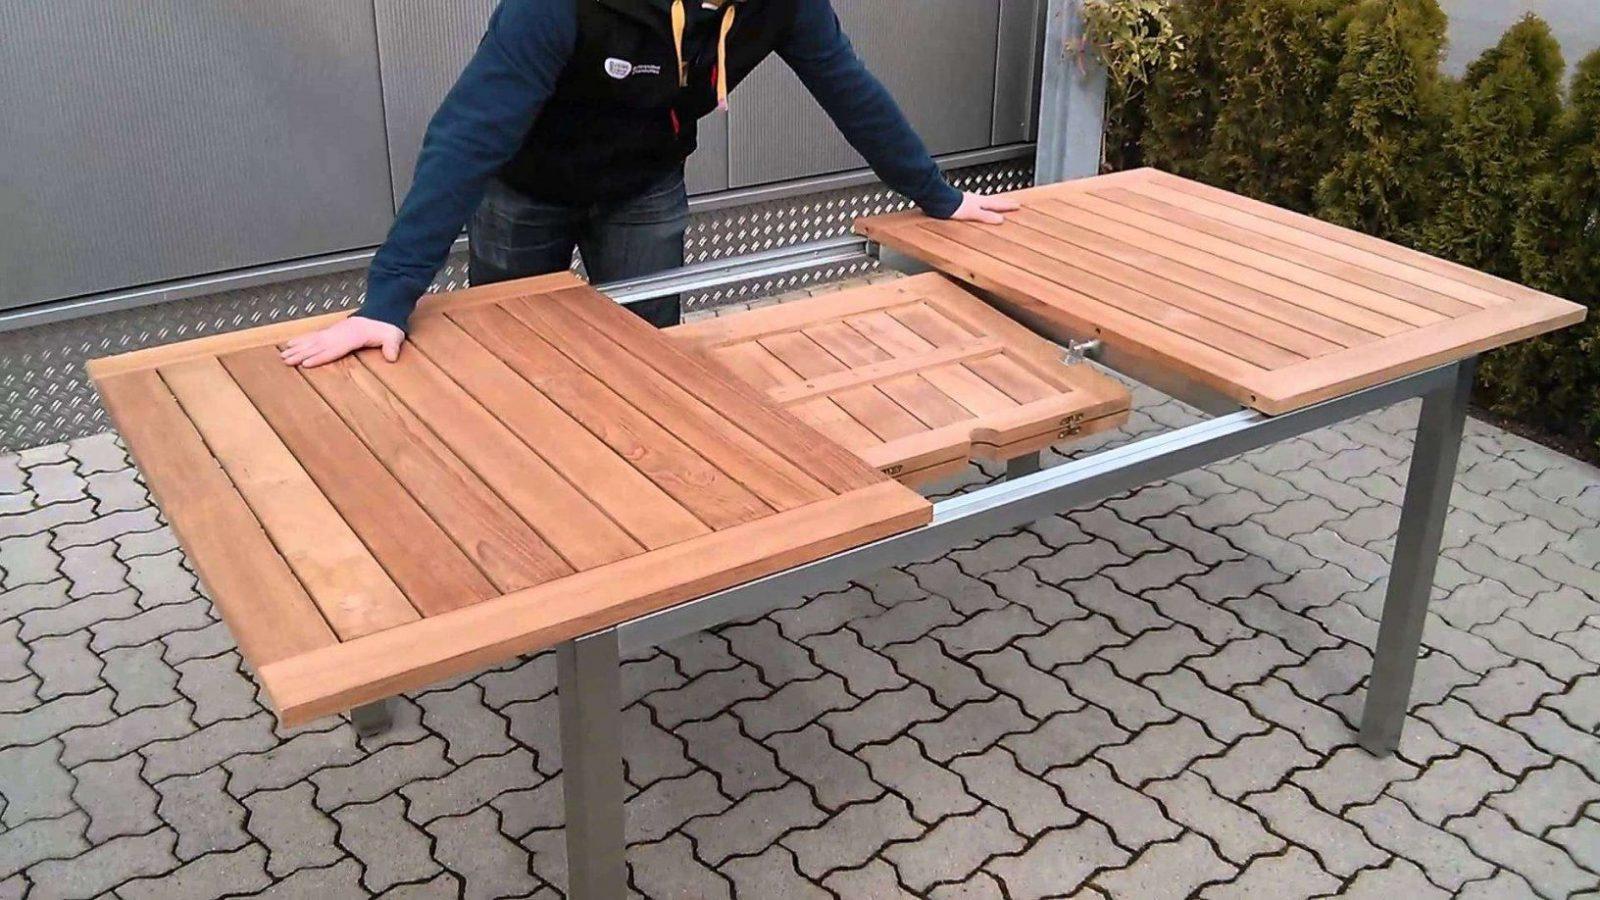 Gartentisch Selber Bauen Rustikal Designideen Of Holztisch